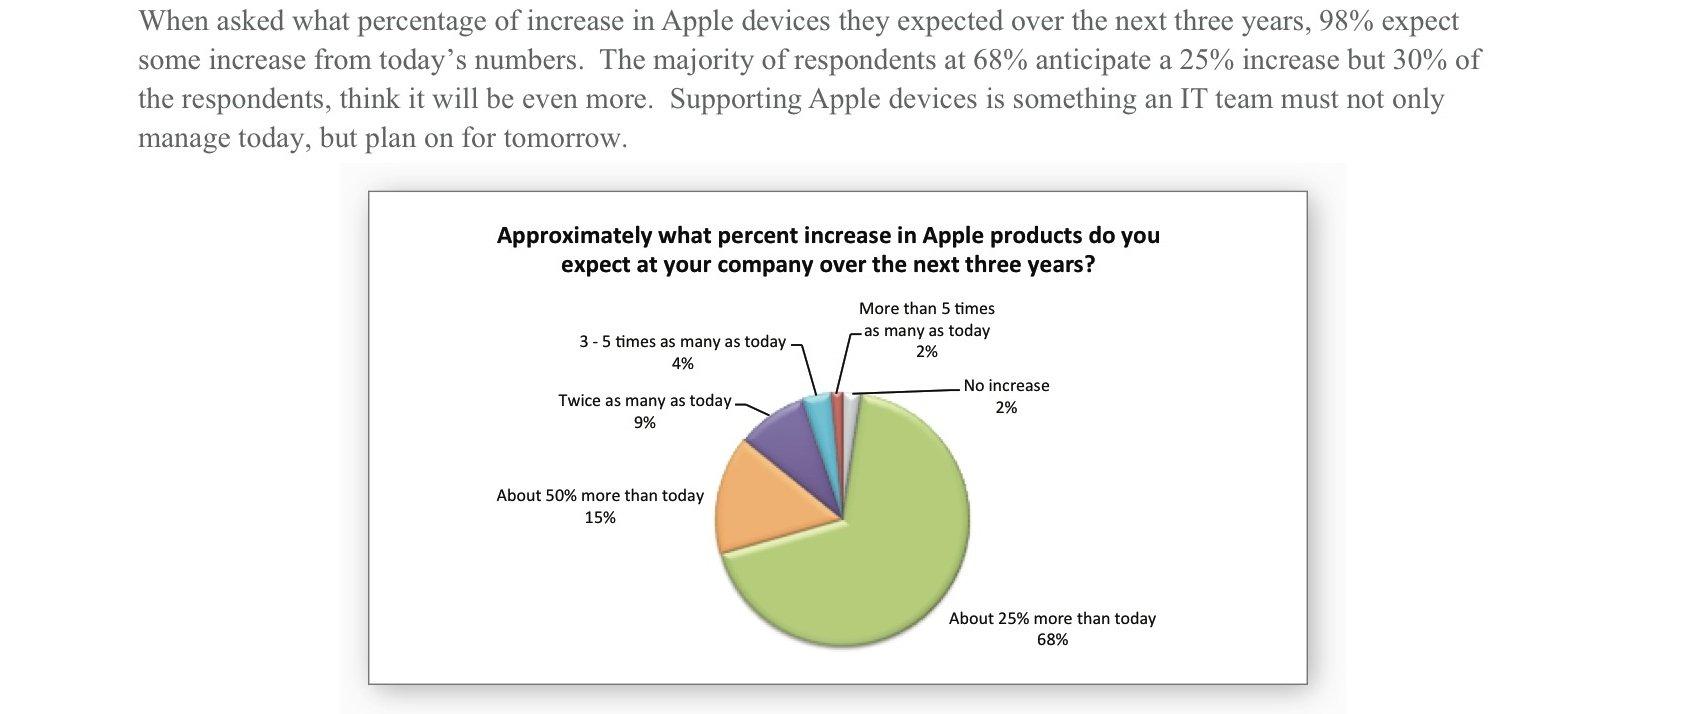 jamf-apple-enterprise-survey-6.jpg